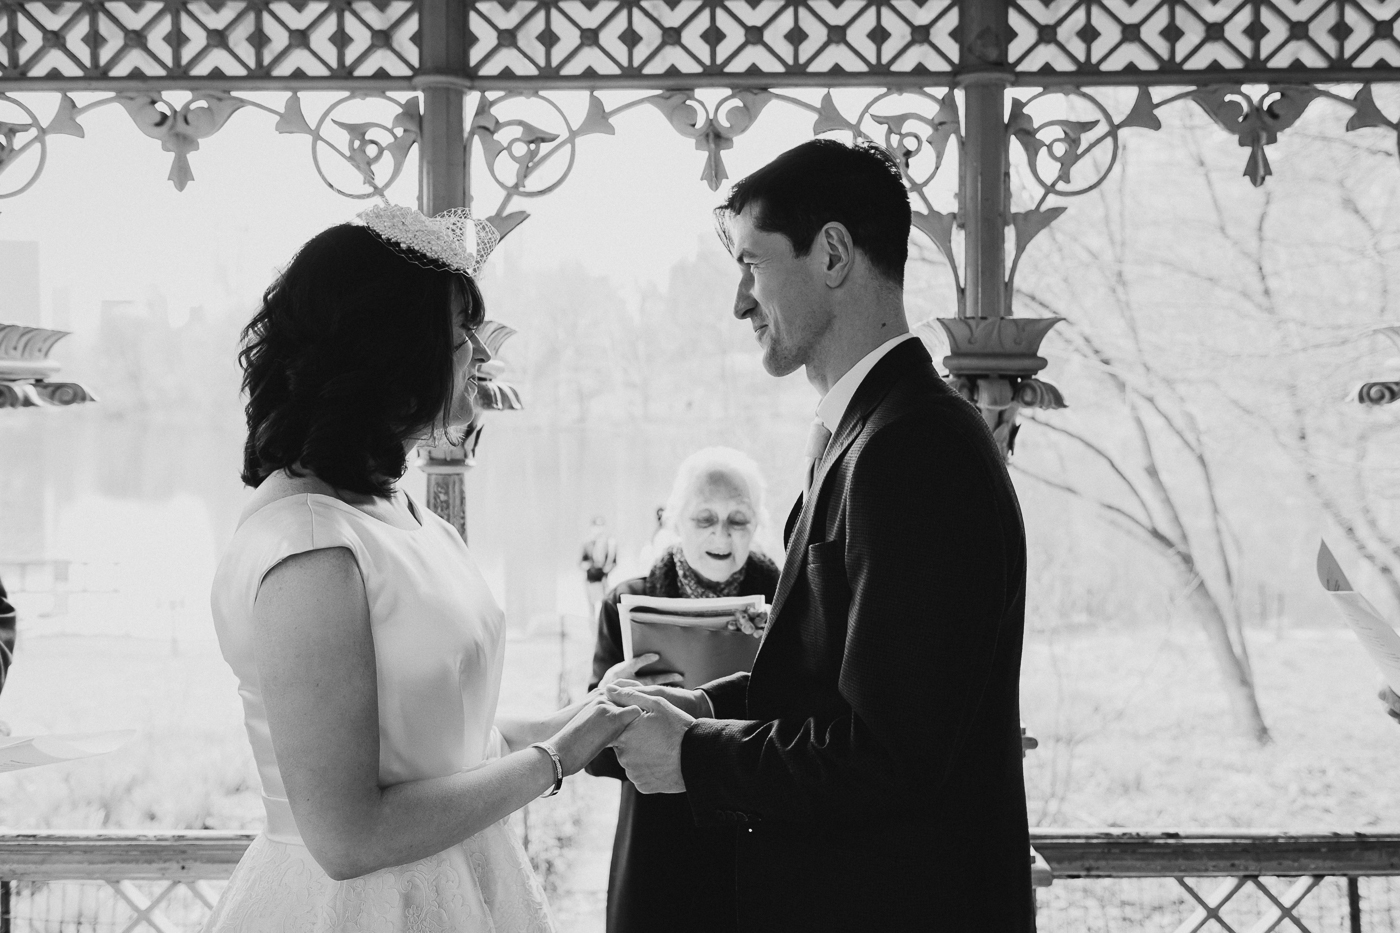 Ladies-Pavilion-Central-Park-NYC-Documentary-Elopement-Wedding-Photographer-26.jpg